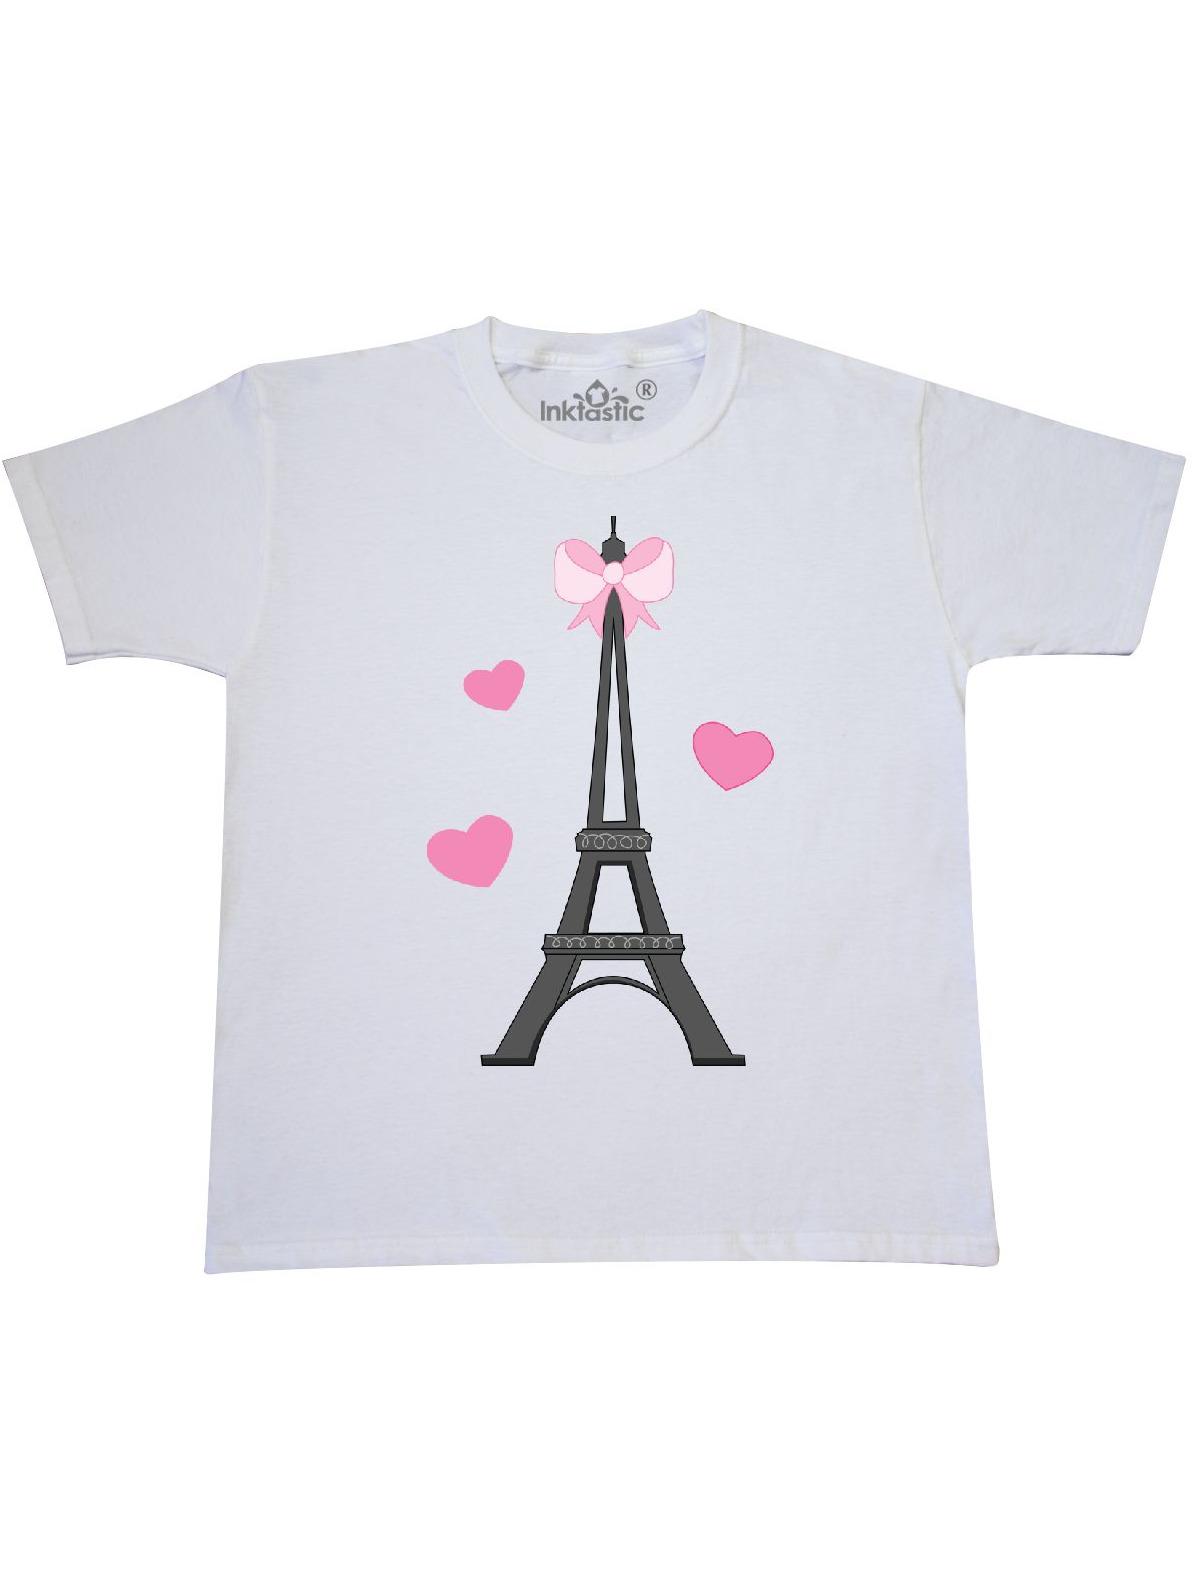 Paris Lover Eiffel Tower Youth T-Shirt